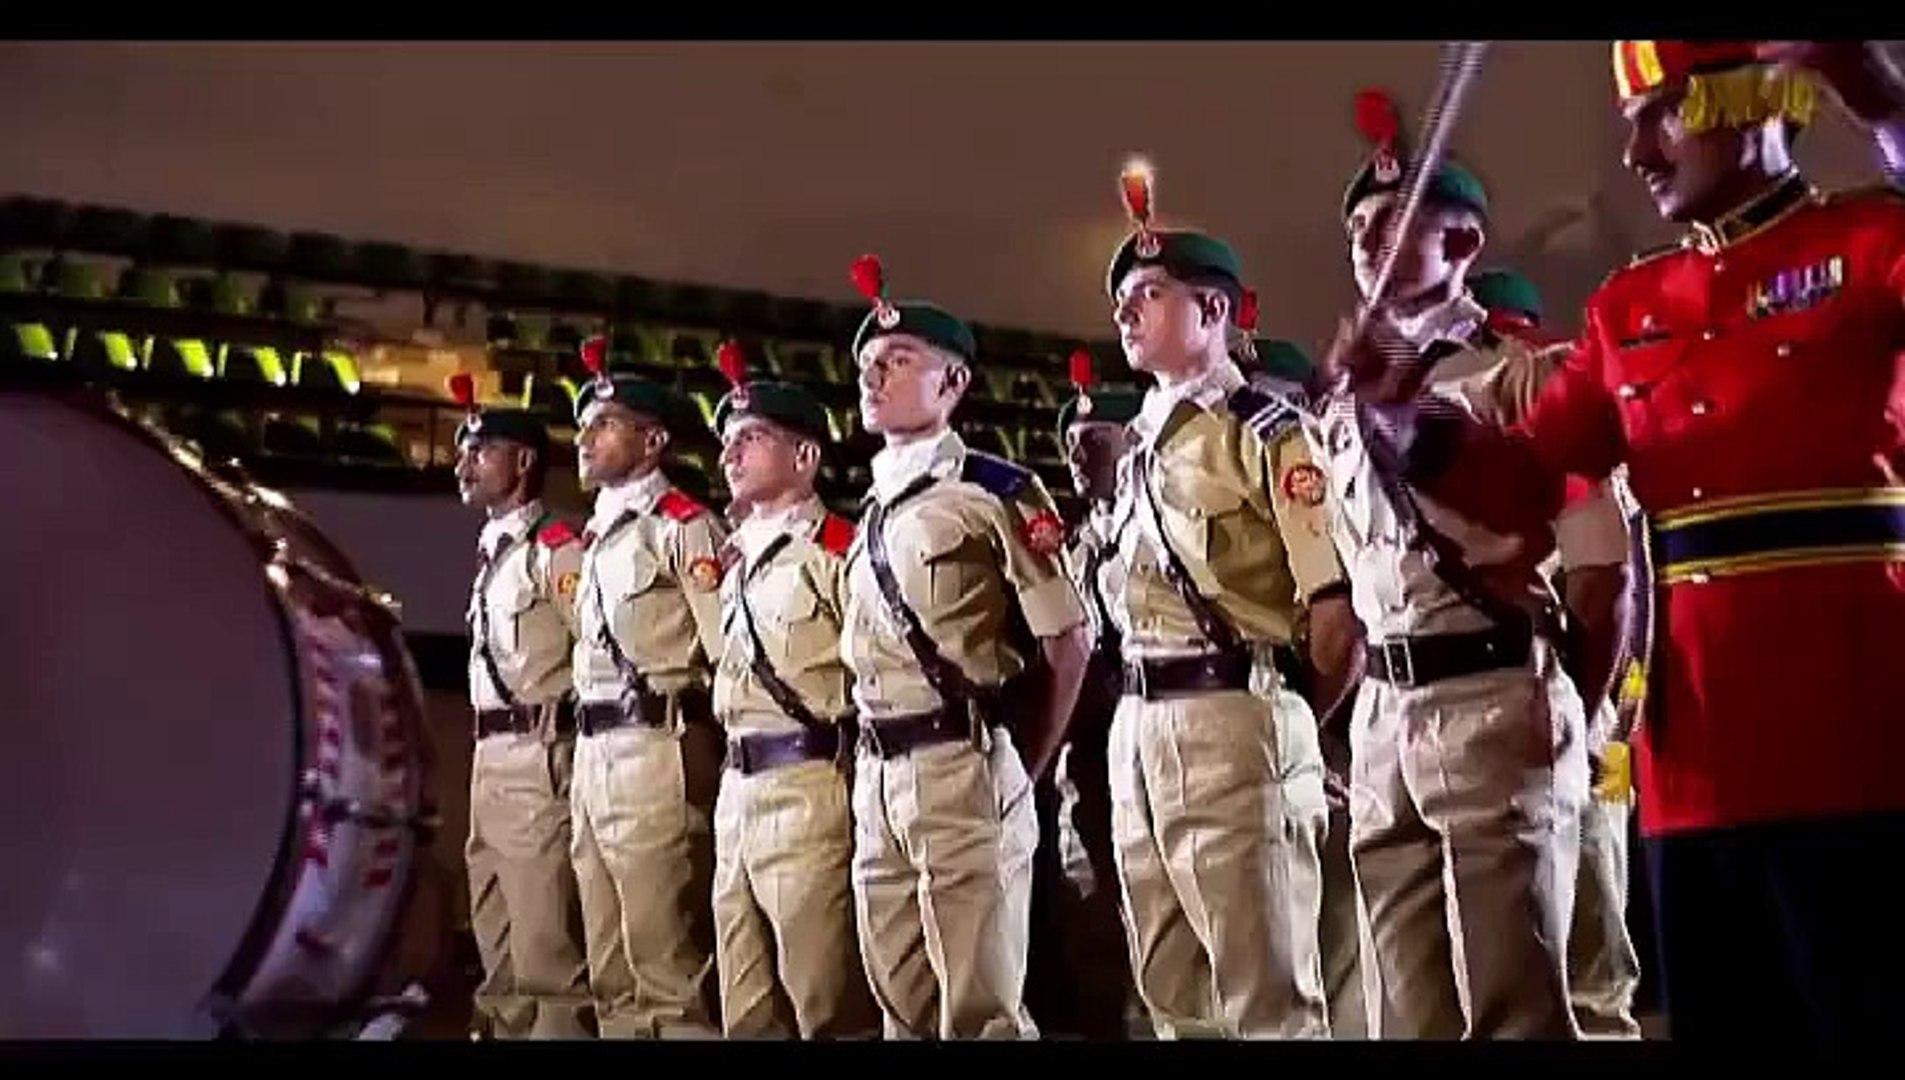 Defender  ISPR documentary on Pakistan Armed Forces winner of Rome Film festival best documentary aw